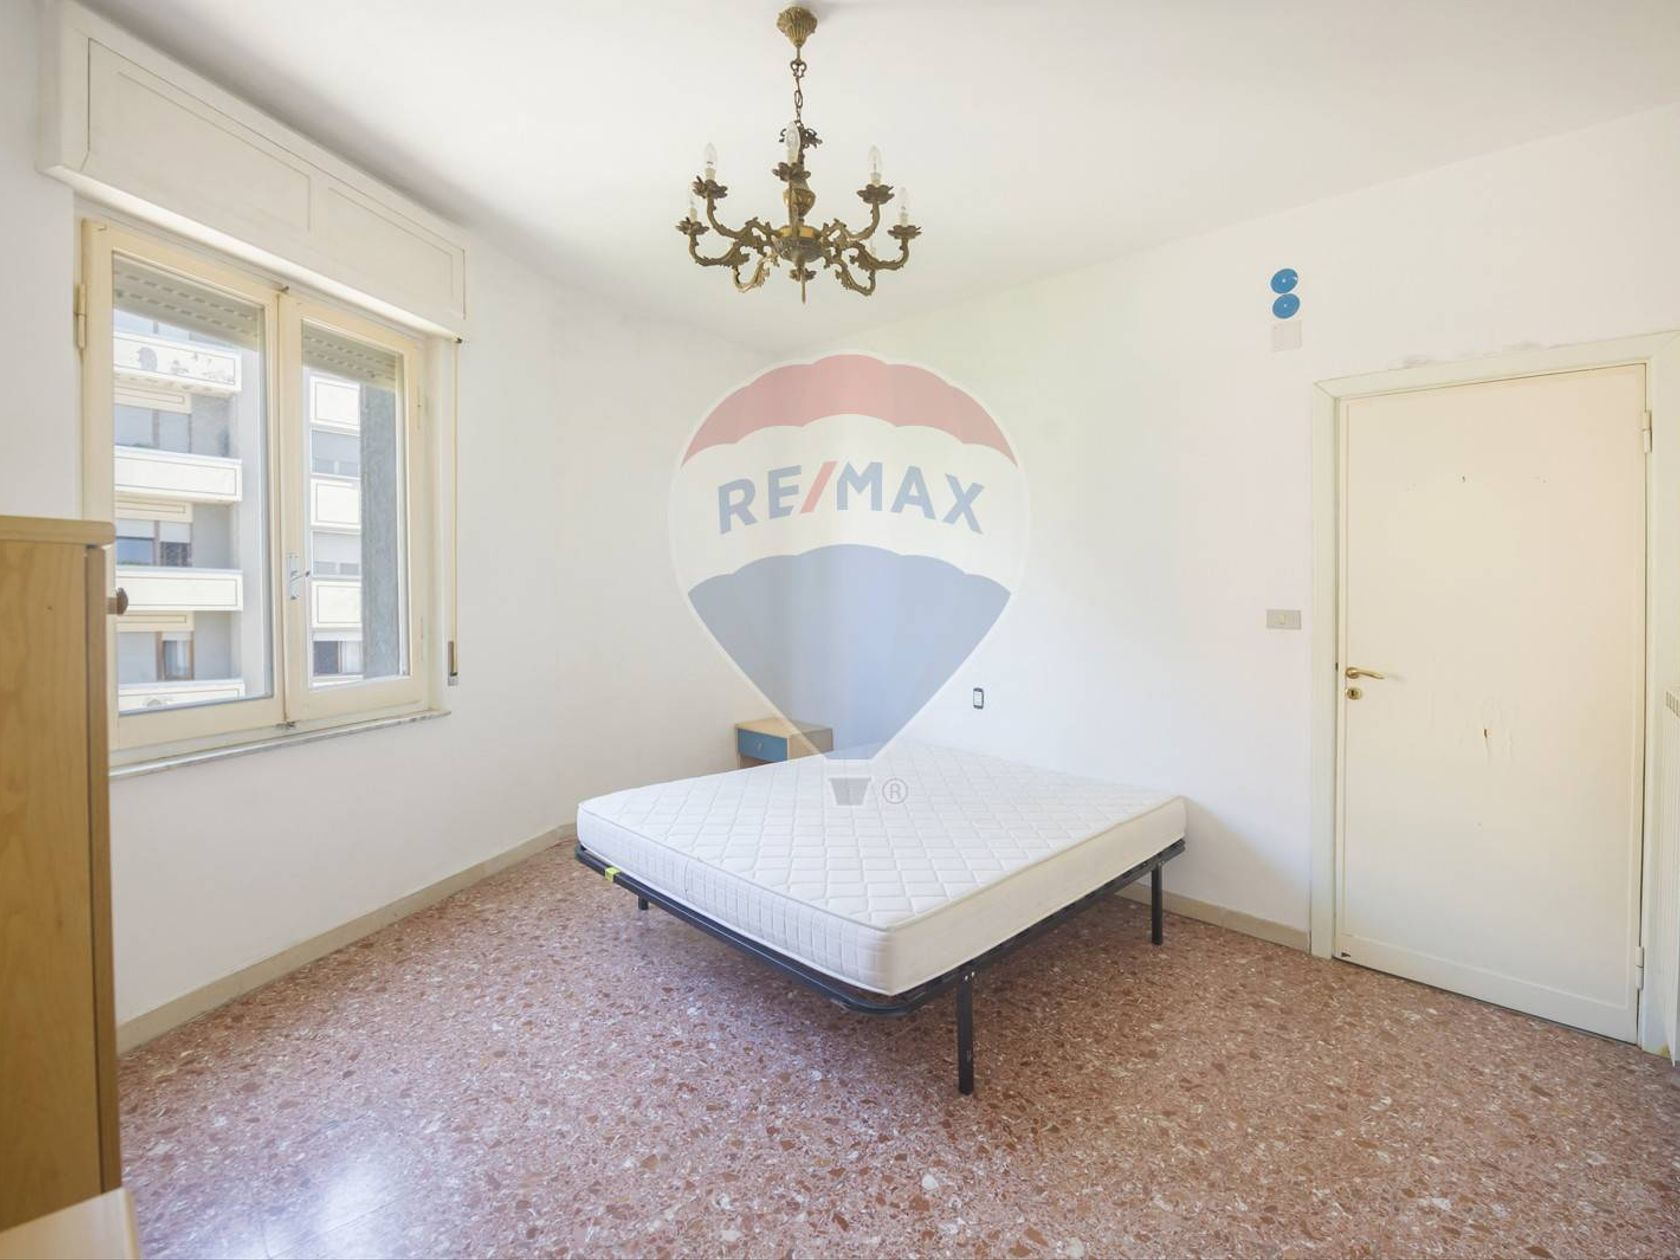 Appartamento Porta Nuova, Pescara, PE Vendita - Foto 13